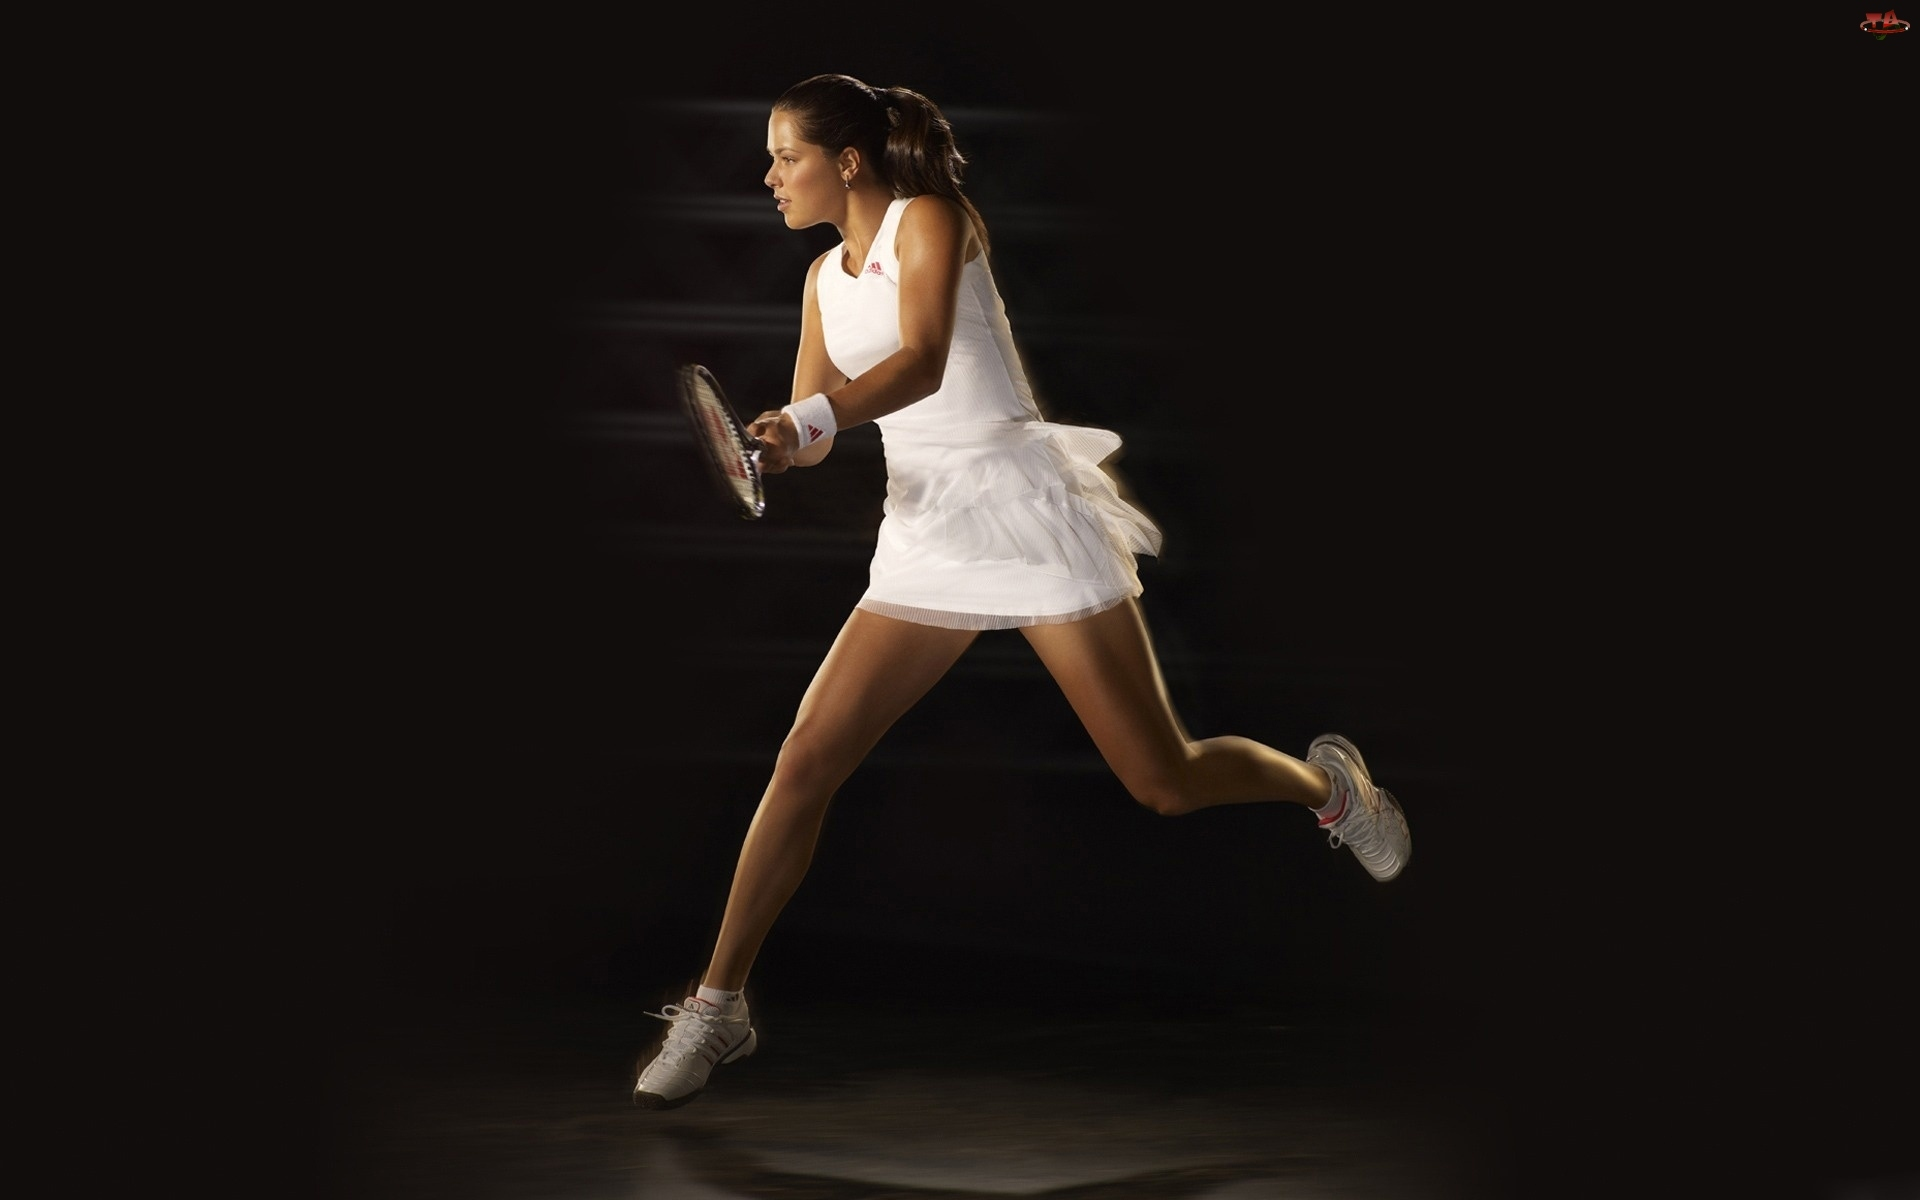 Ana Ivanović, Kobieta, Tenis